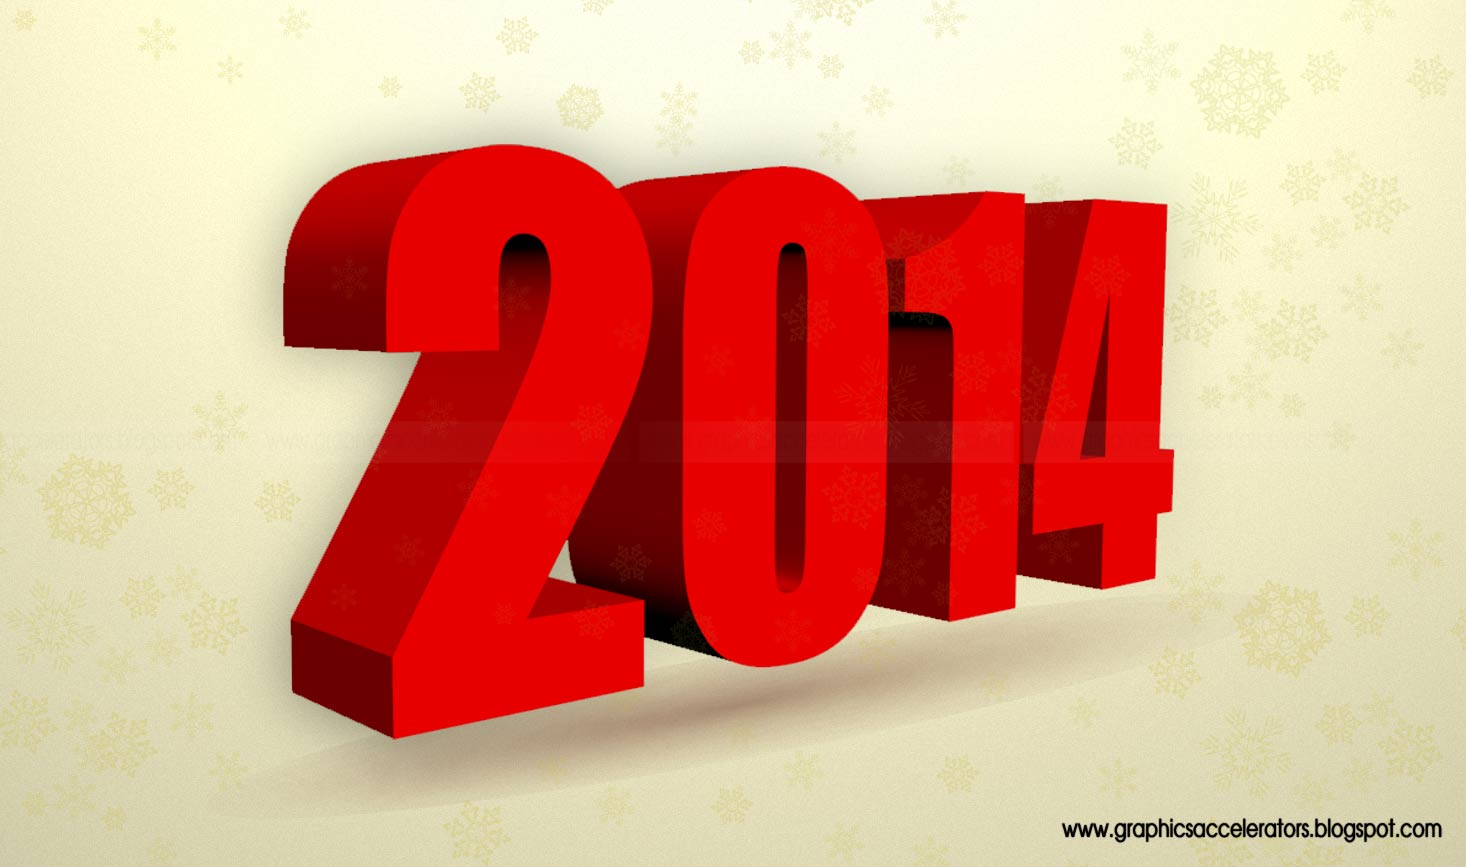 ��� ������� ������� ��� ����� ��������� 2014 Happy New Year